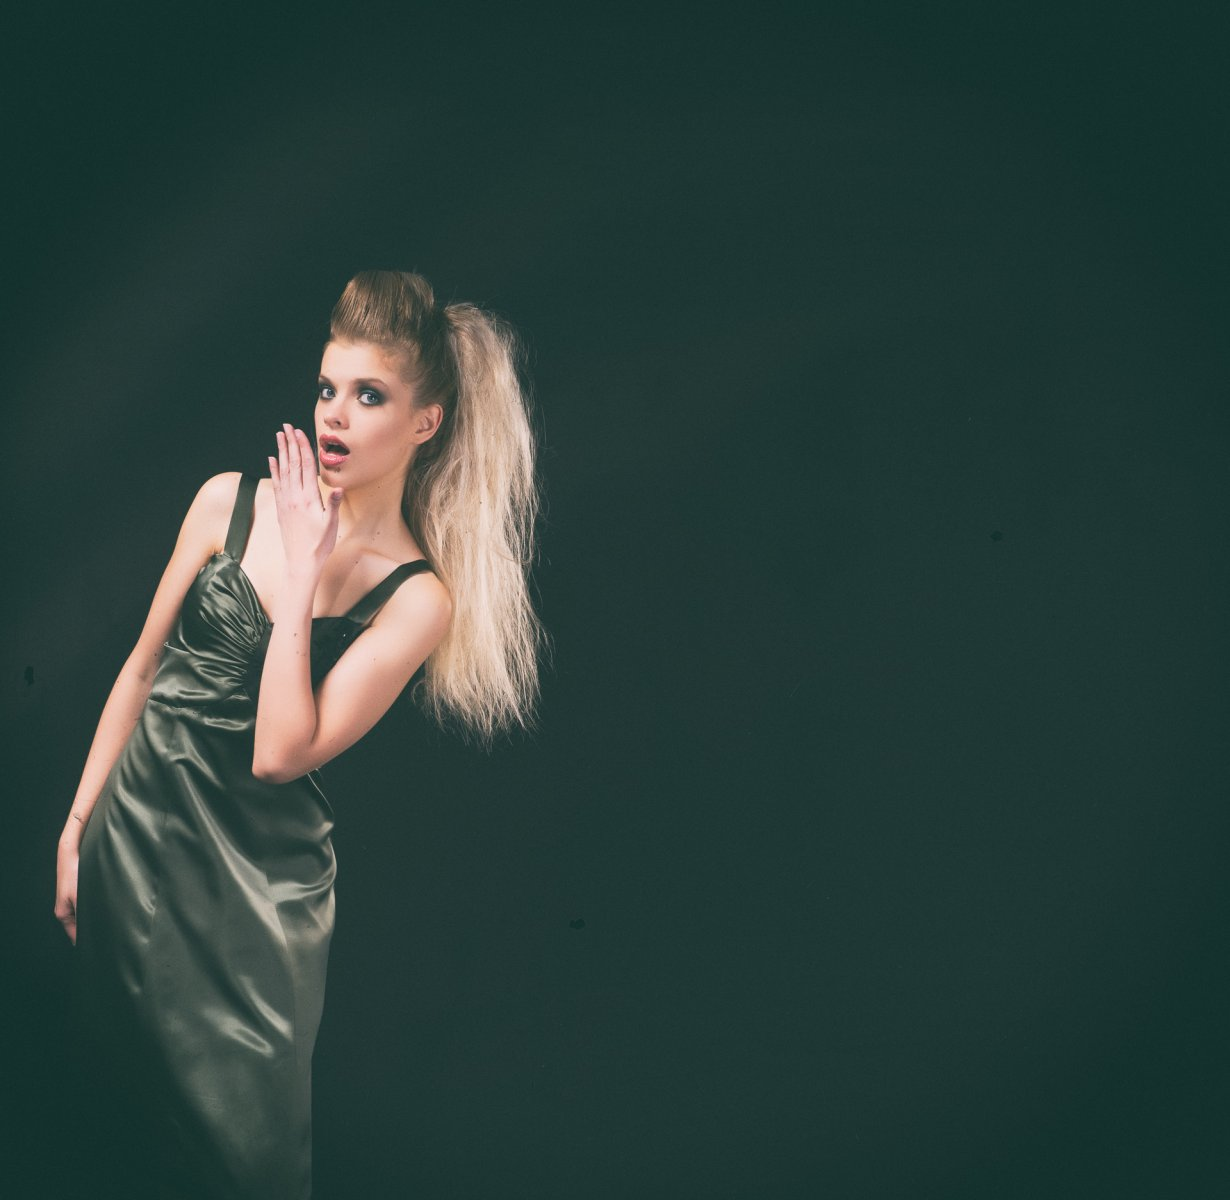 108-Georgina-Hobor Fashion/Adv